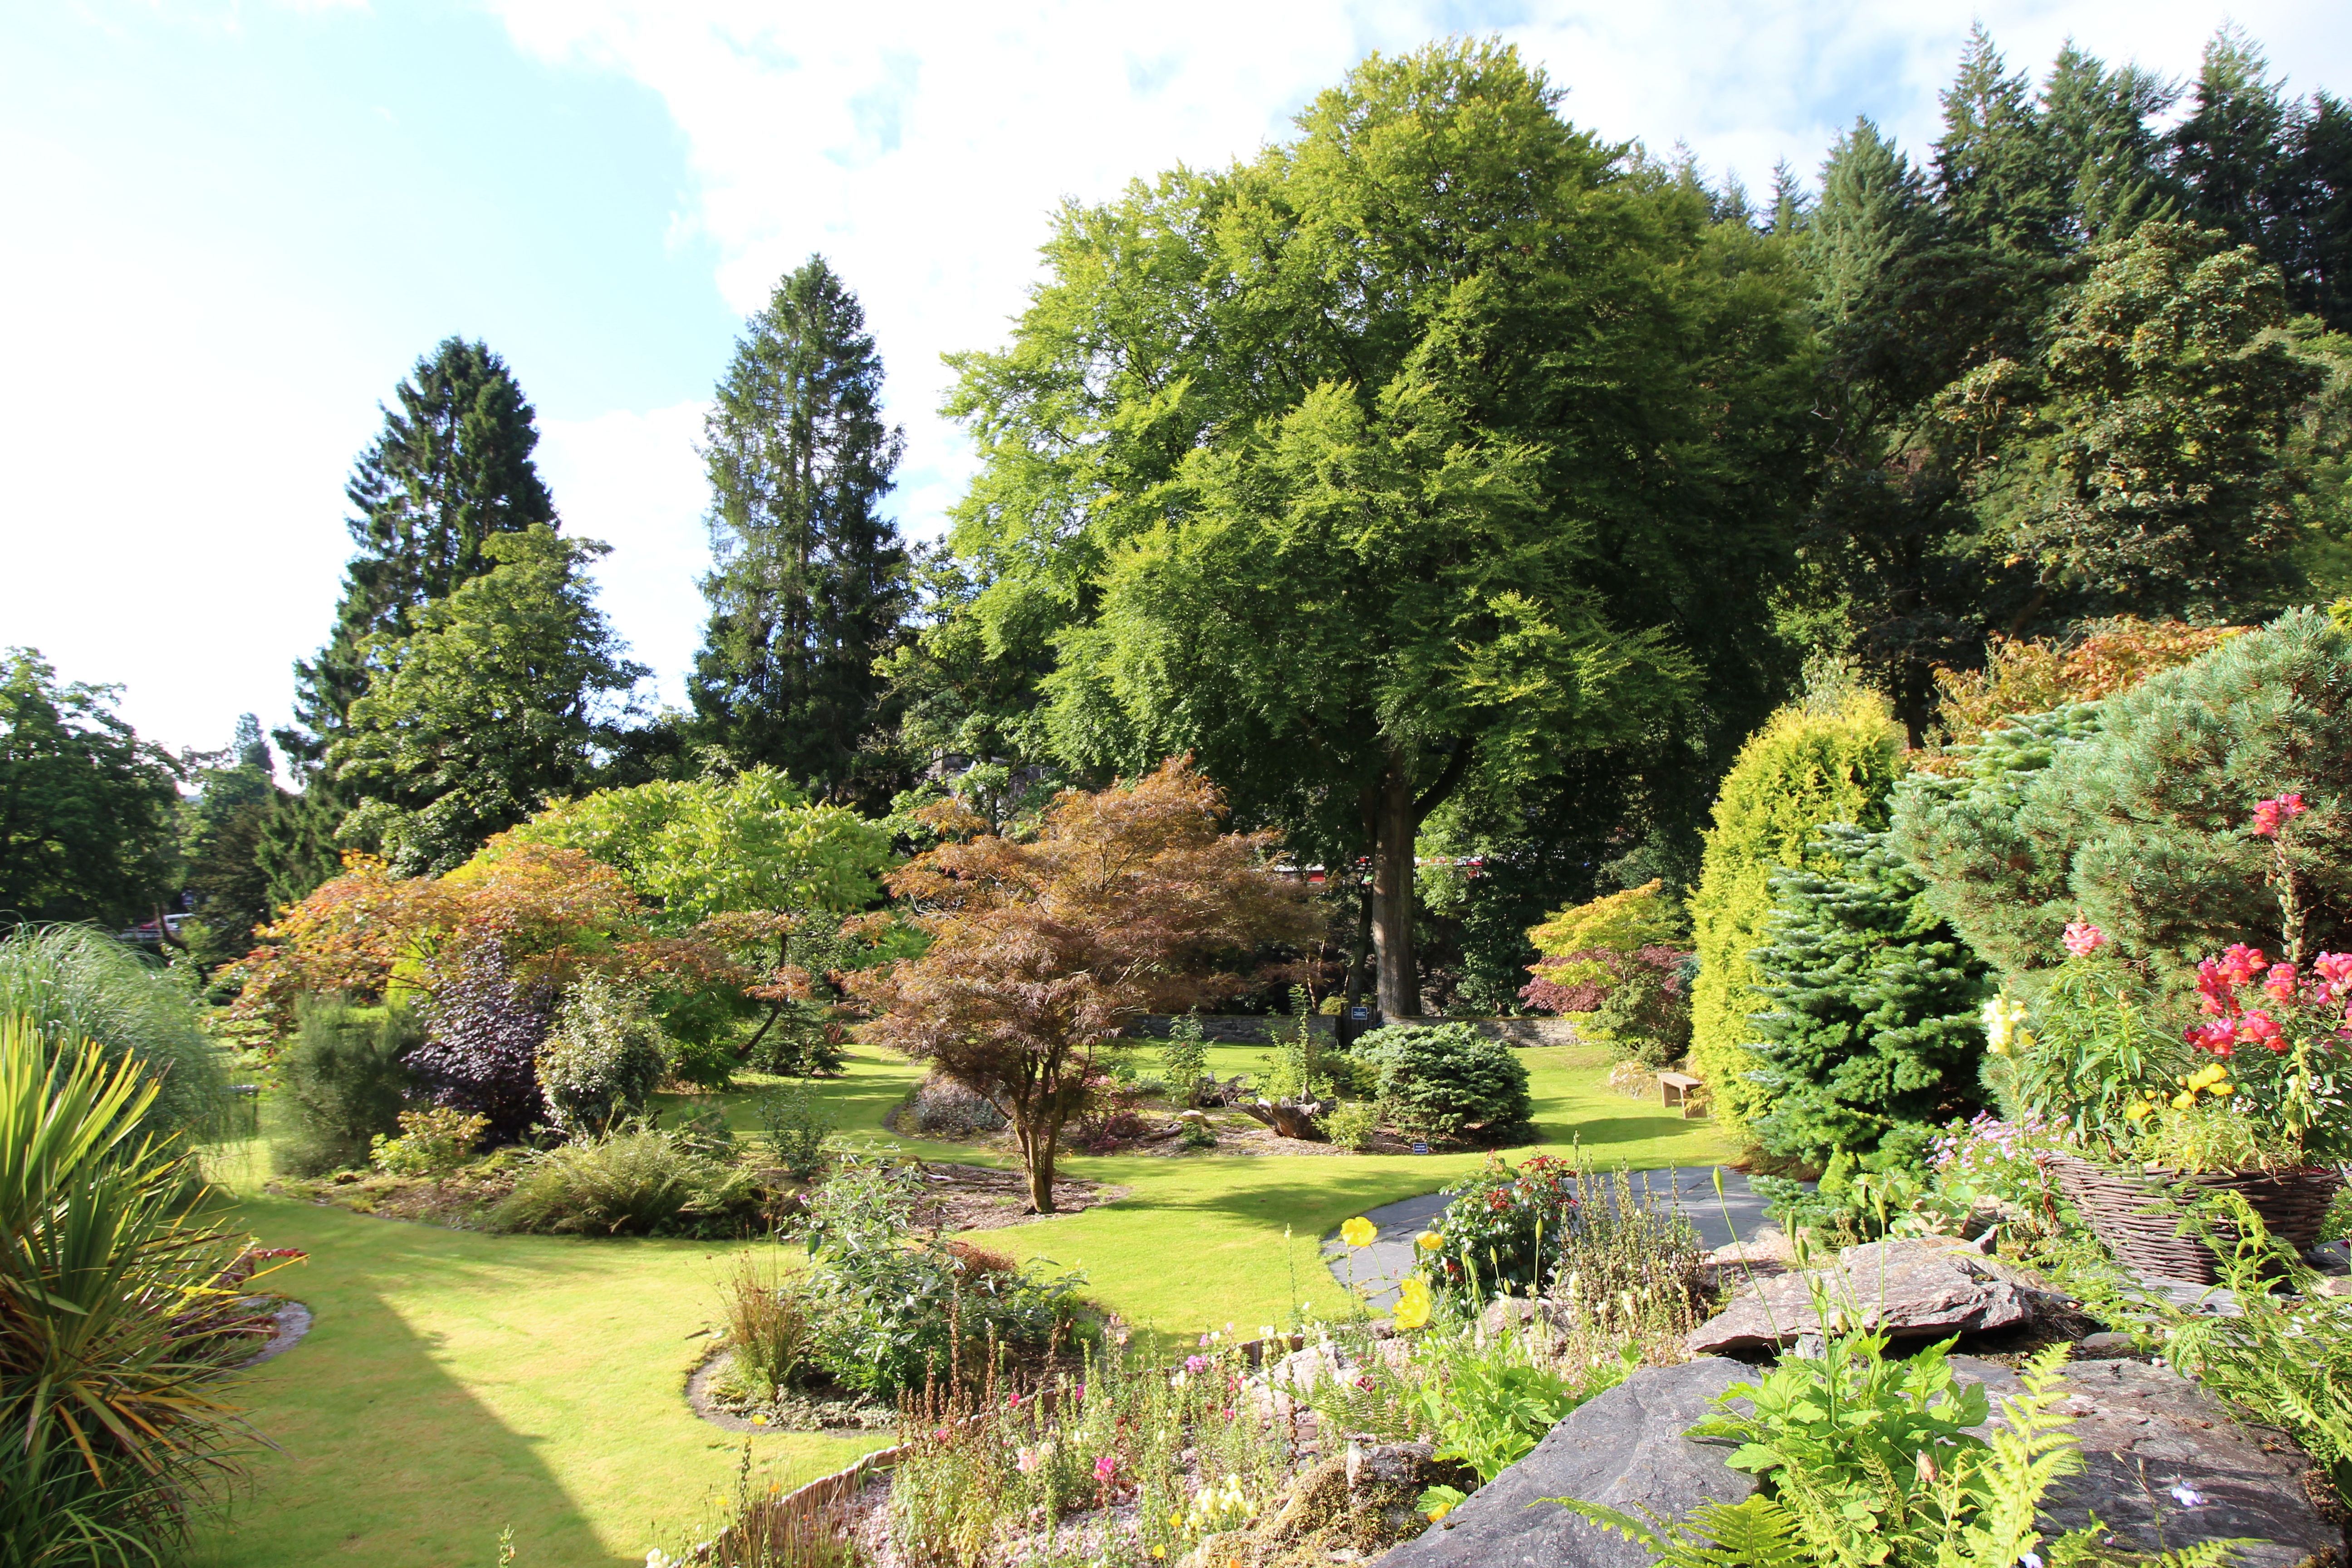 Swn-y-Dwr's landscaped garden 1